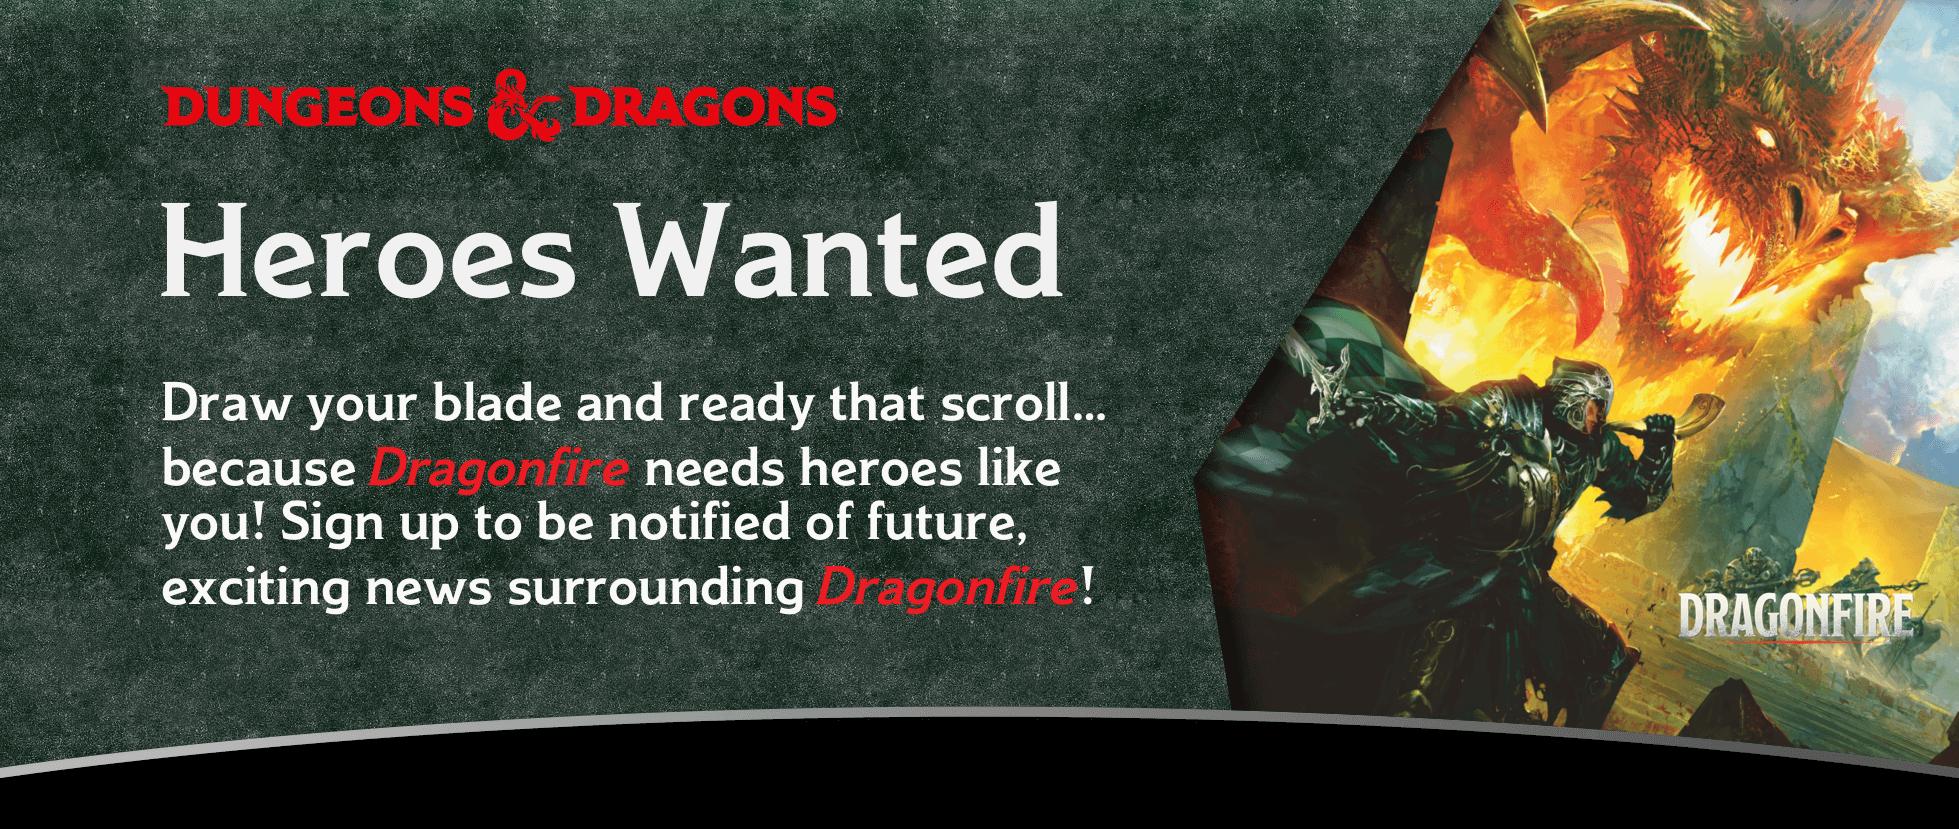 Dragonfire Sign-Up